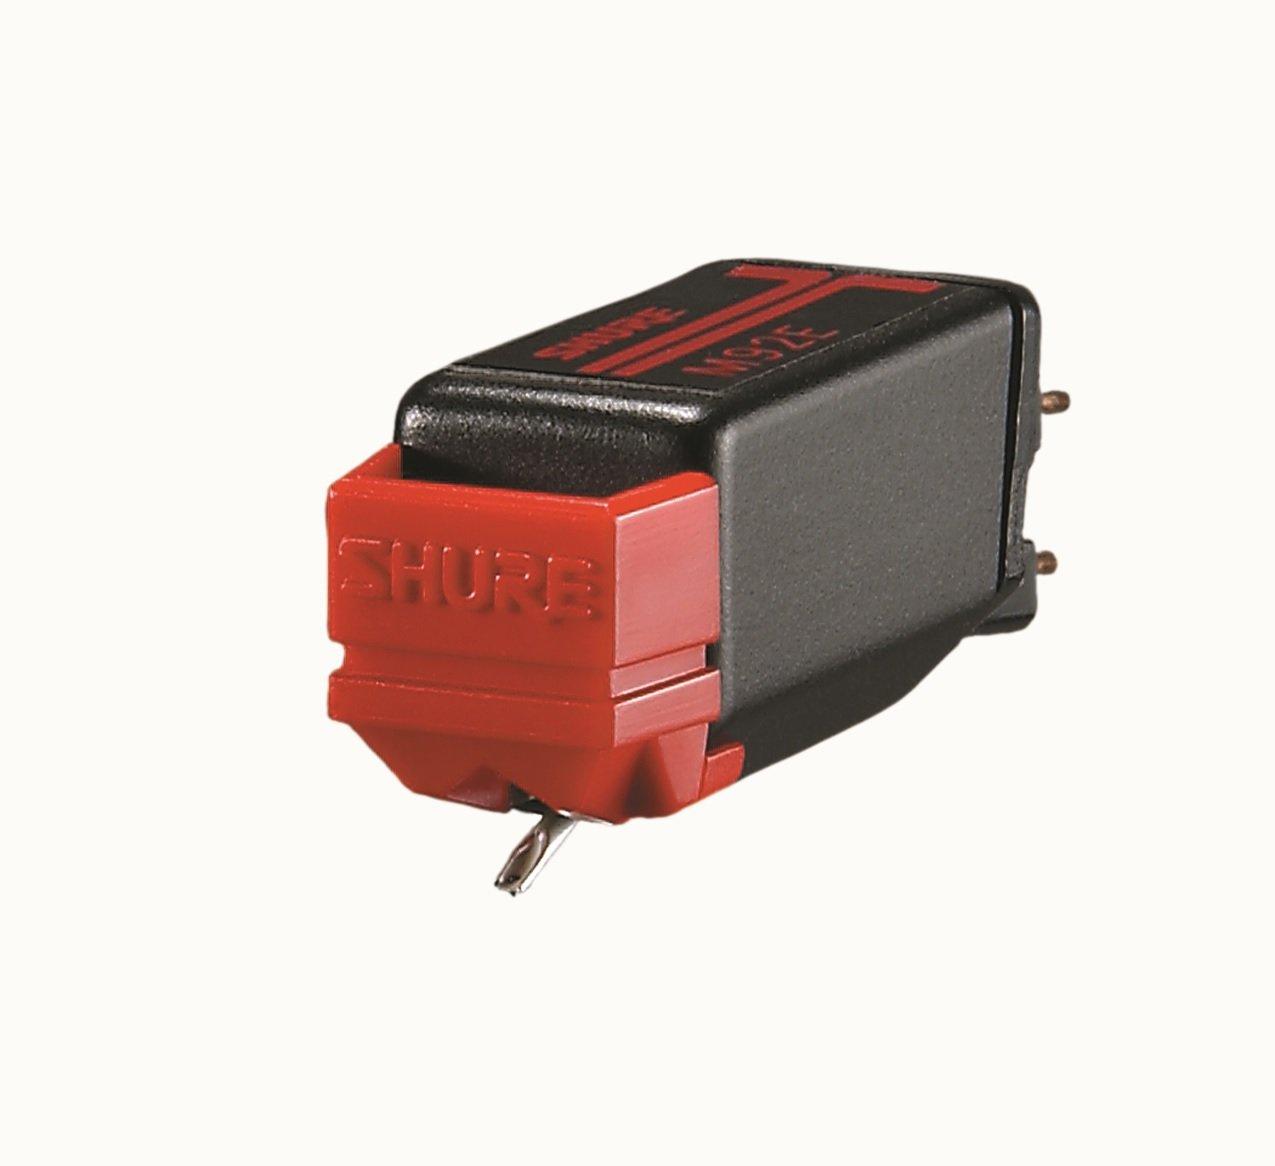 Amazon.com: Shure M92E Hi-Fi Moving Magnet Cartridge: Musical